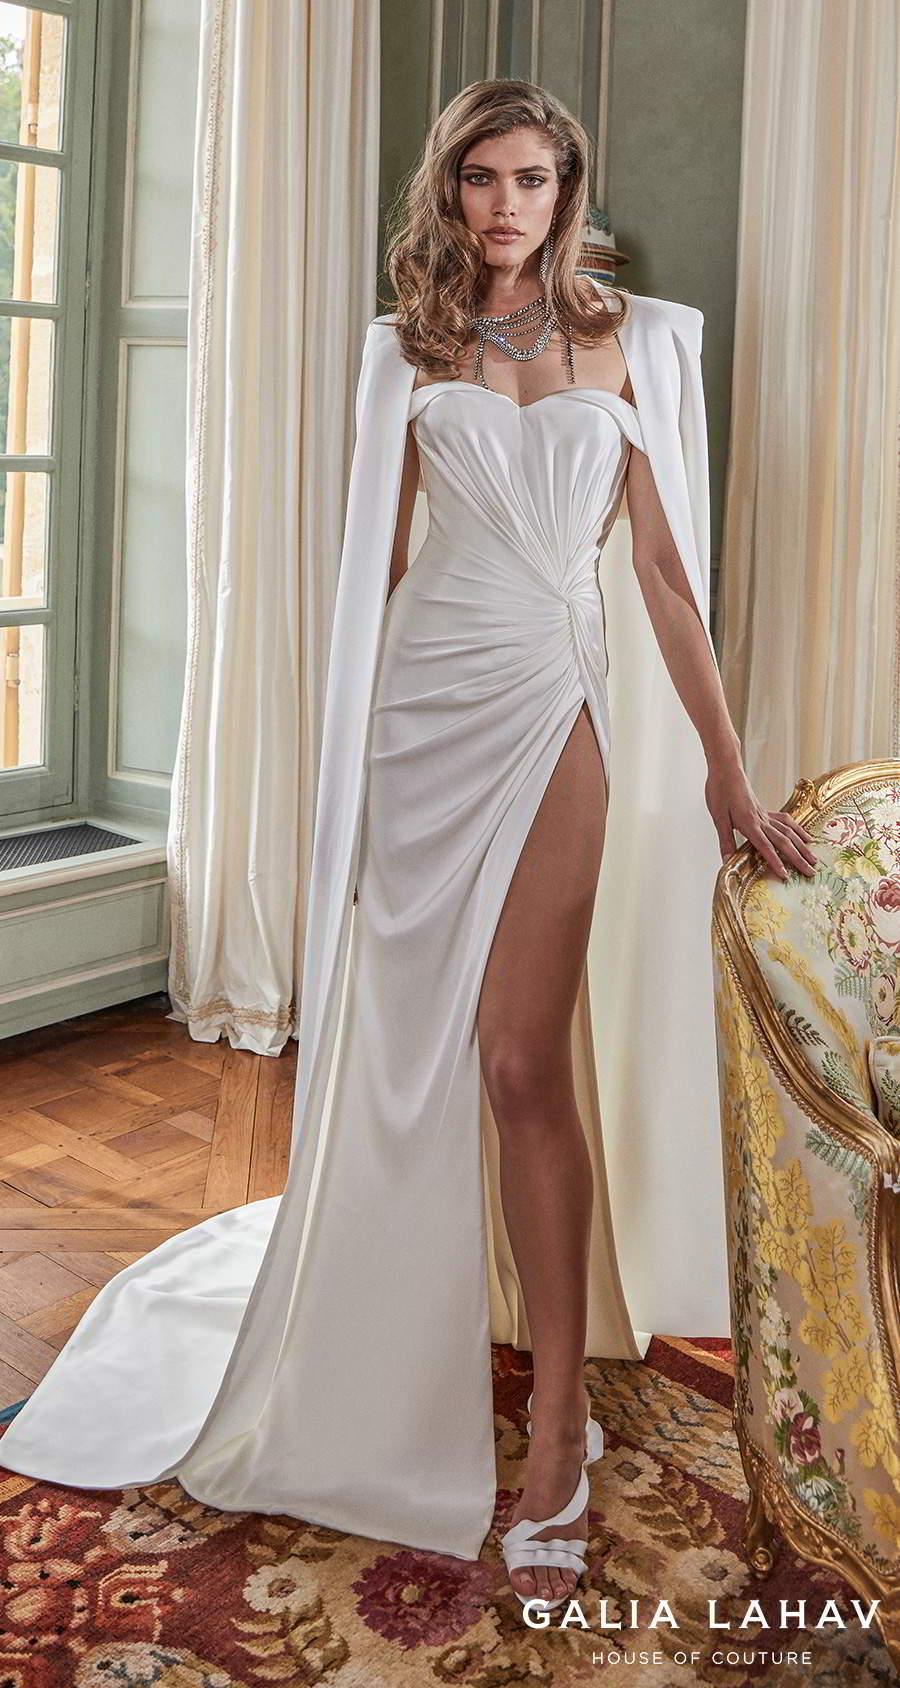 galia lahav fall 2020 bridal off the shoulder sweetheart neckline simple minimalist slit skirt elegant sheath wedding dress with cape mid back short train (anna) mv